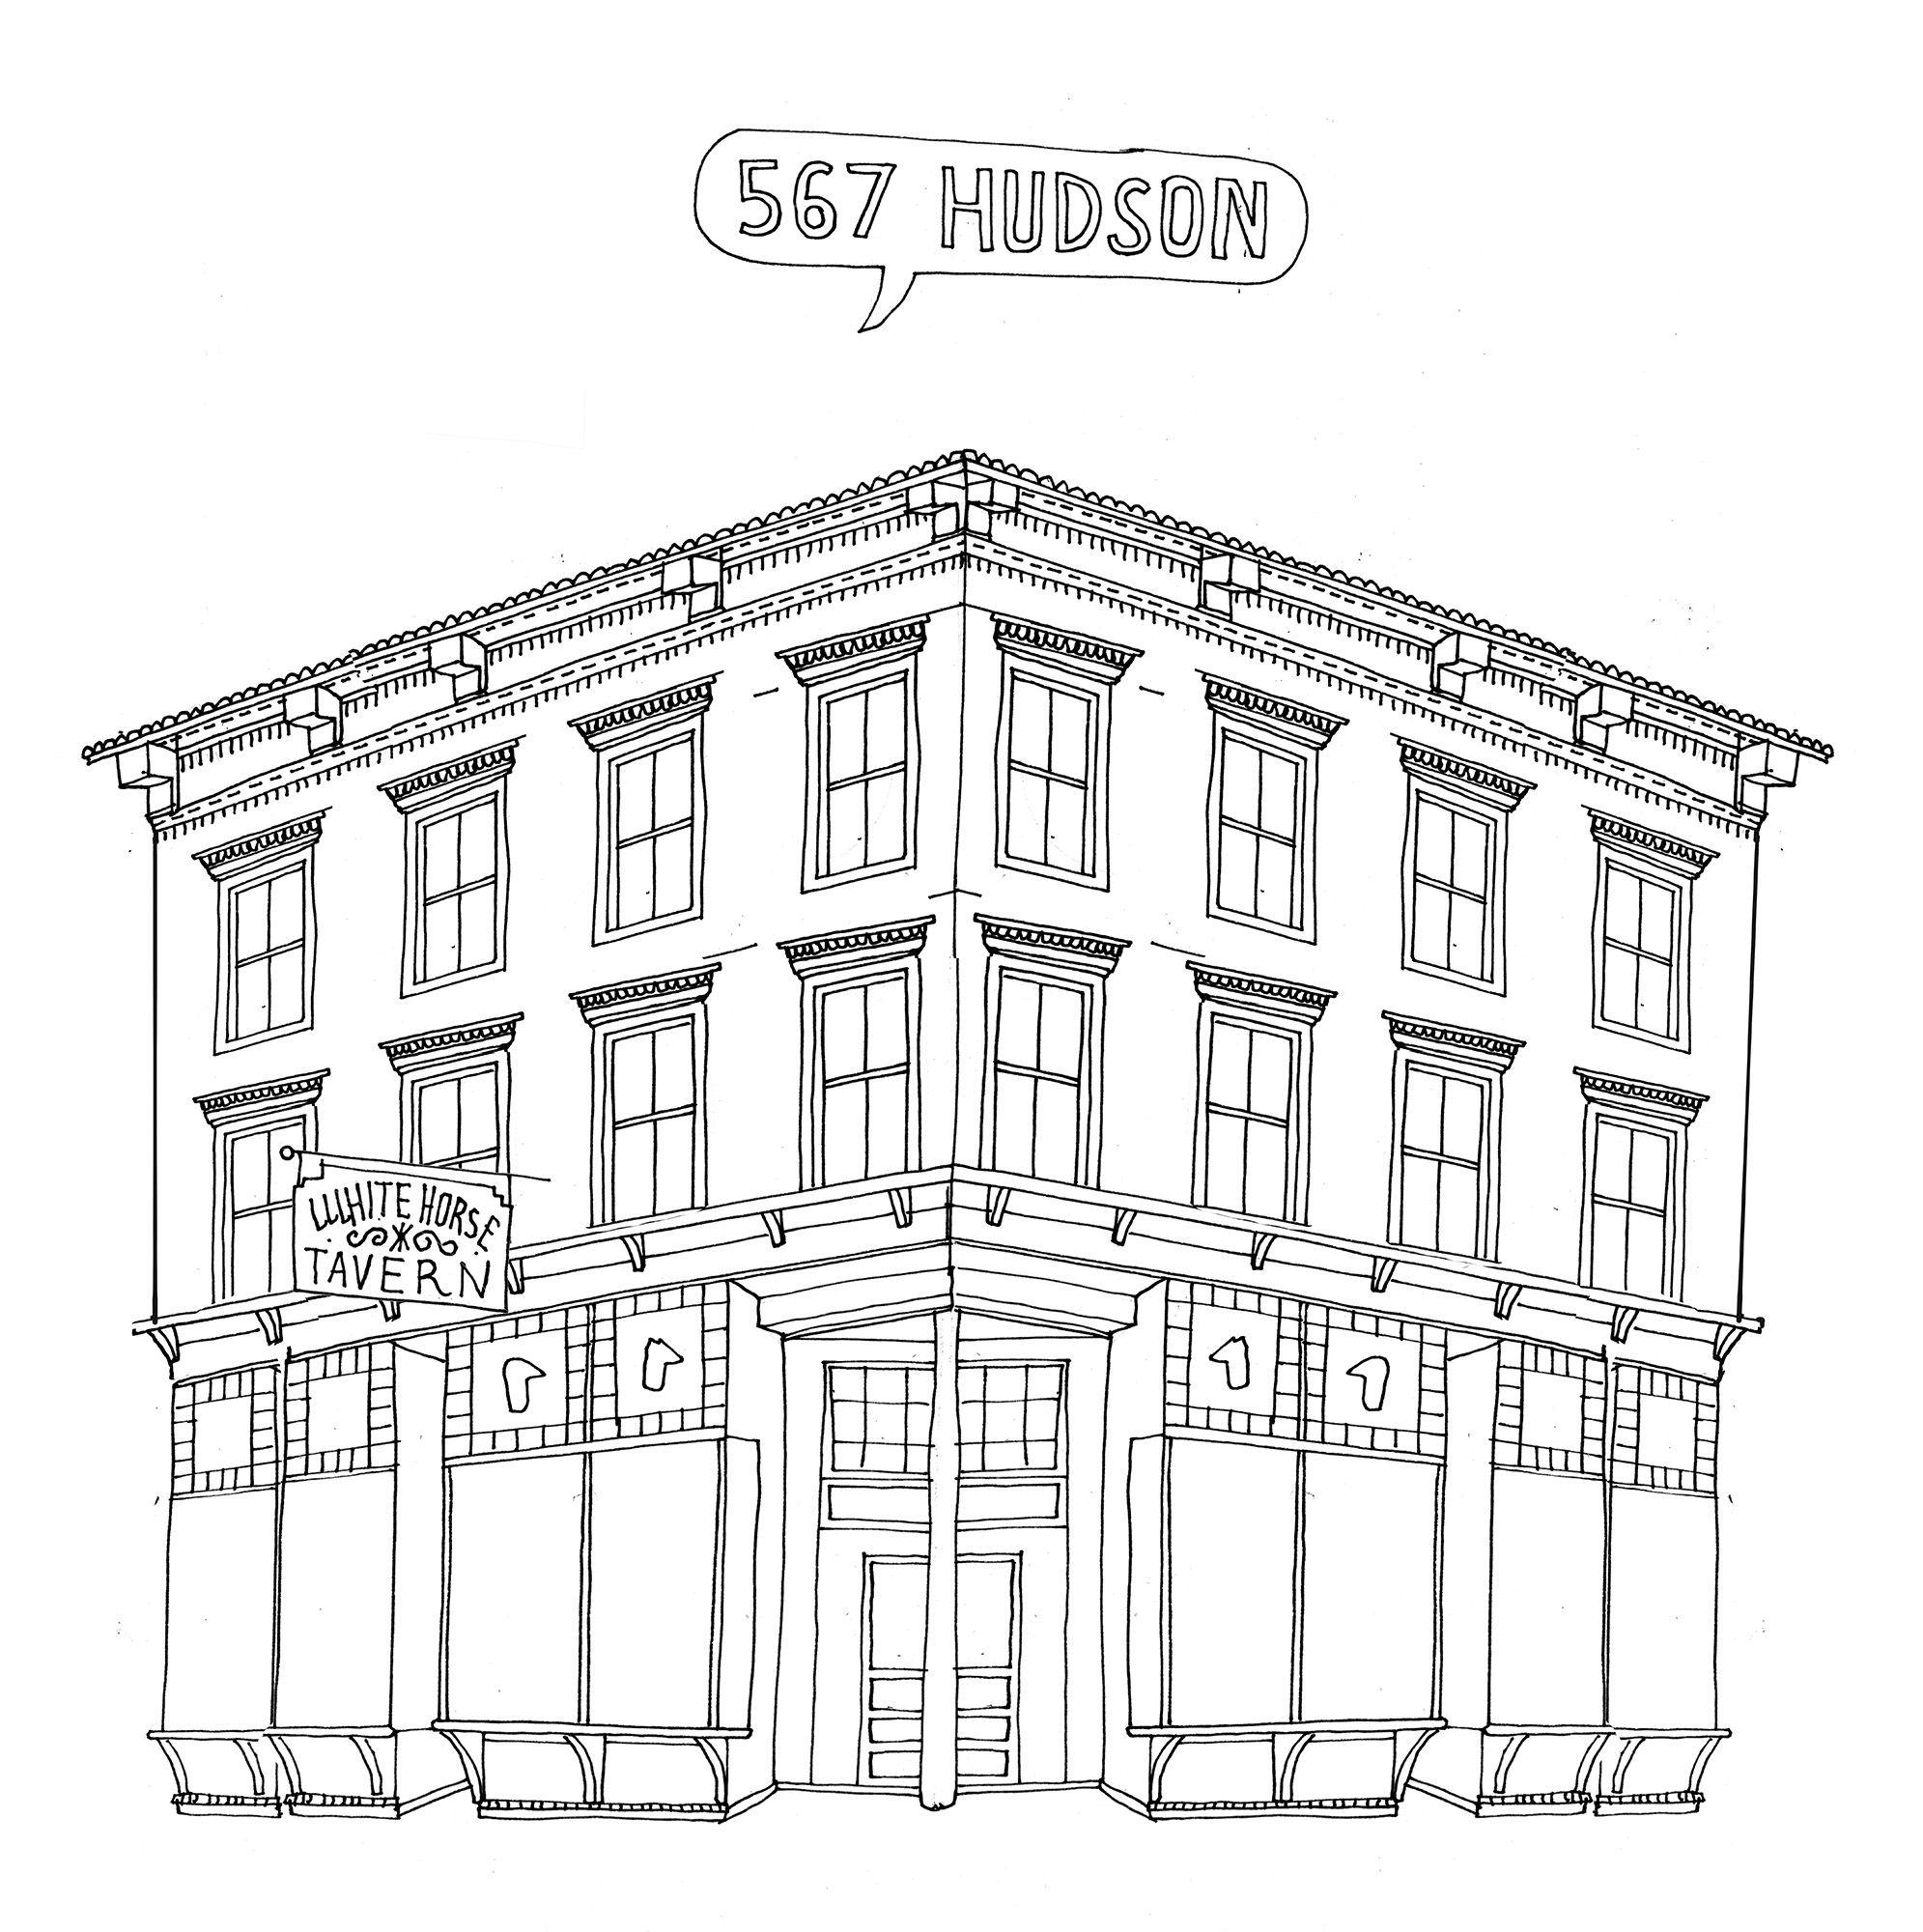 1991x2000 567hudson Drawing Manhattan And Sketchbooks